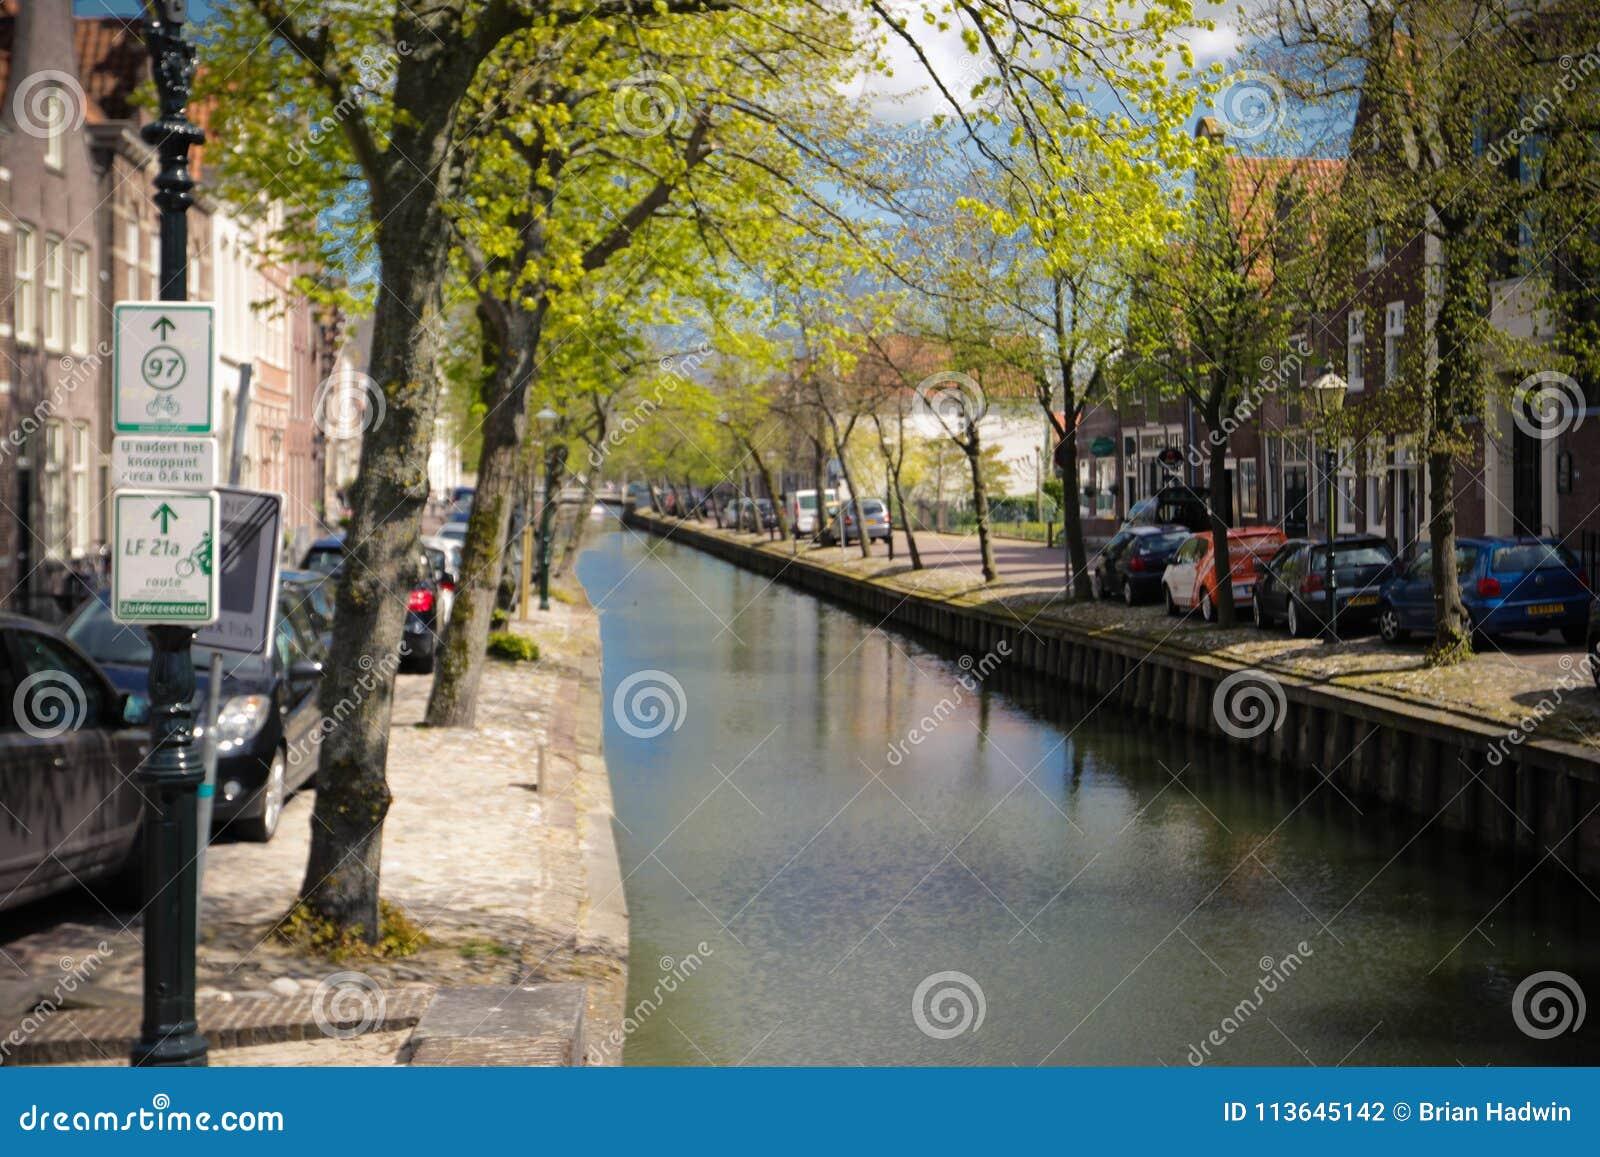 An Edam canal scene